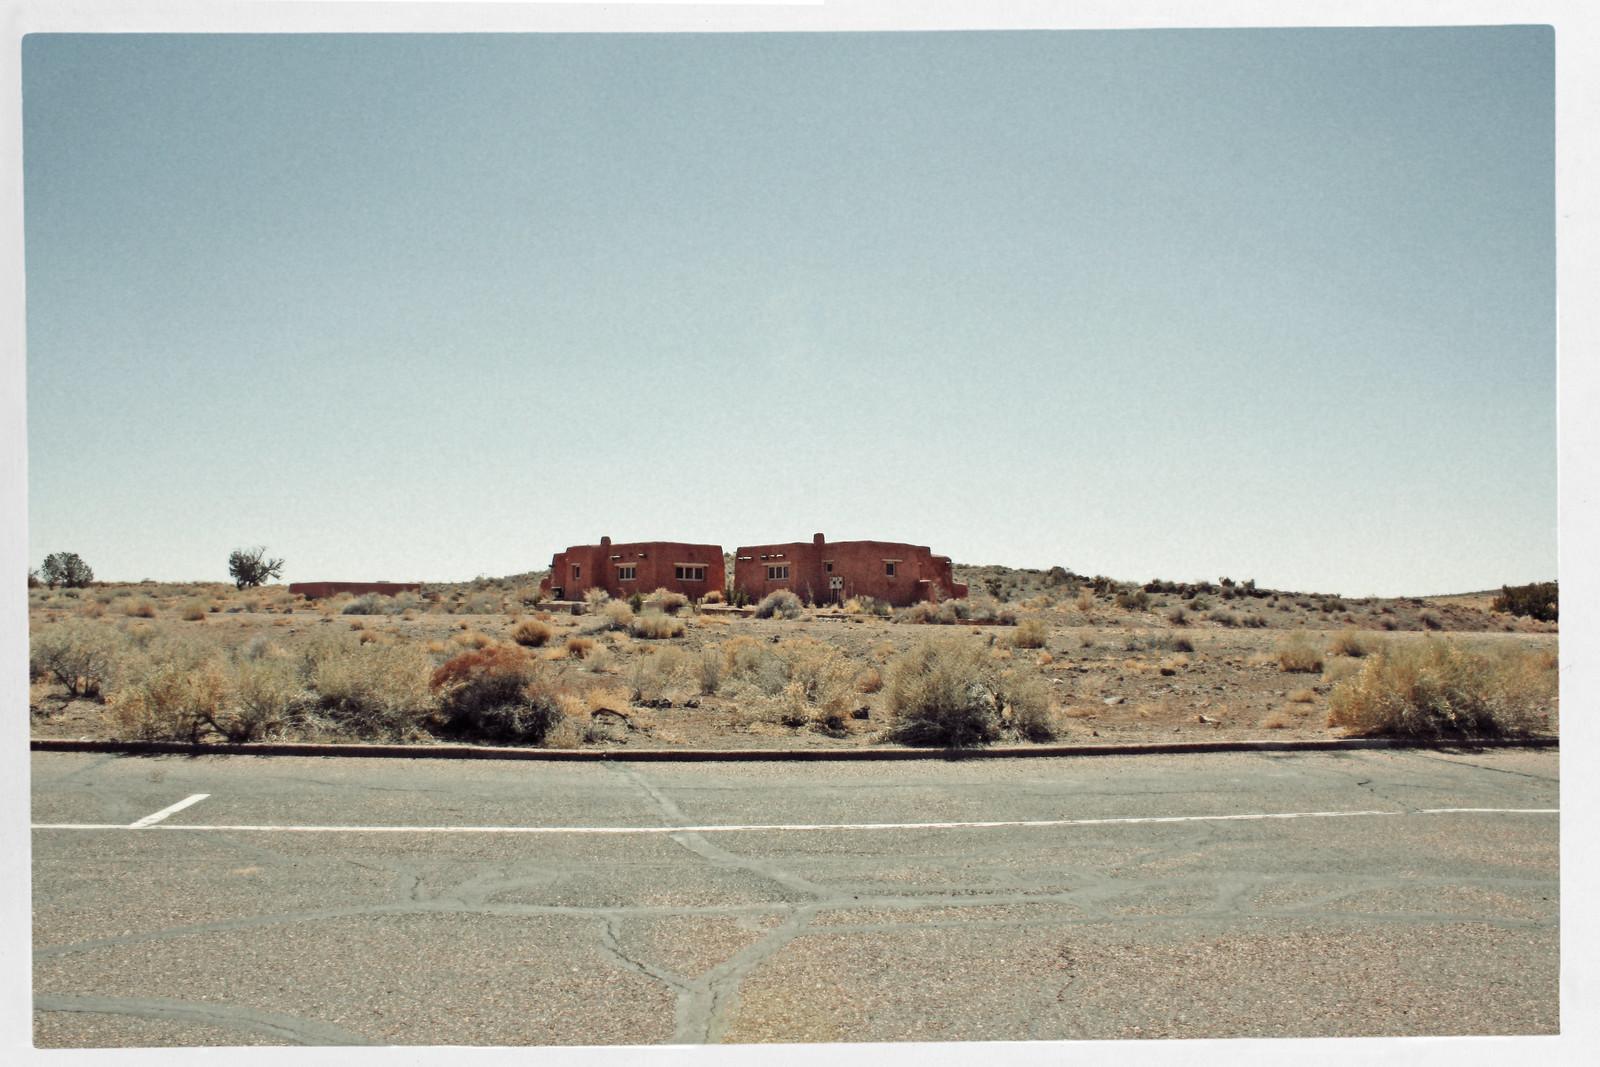 Painted Desert/Petrified Forest Parking Lot